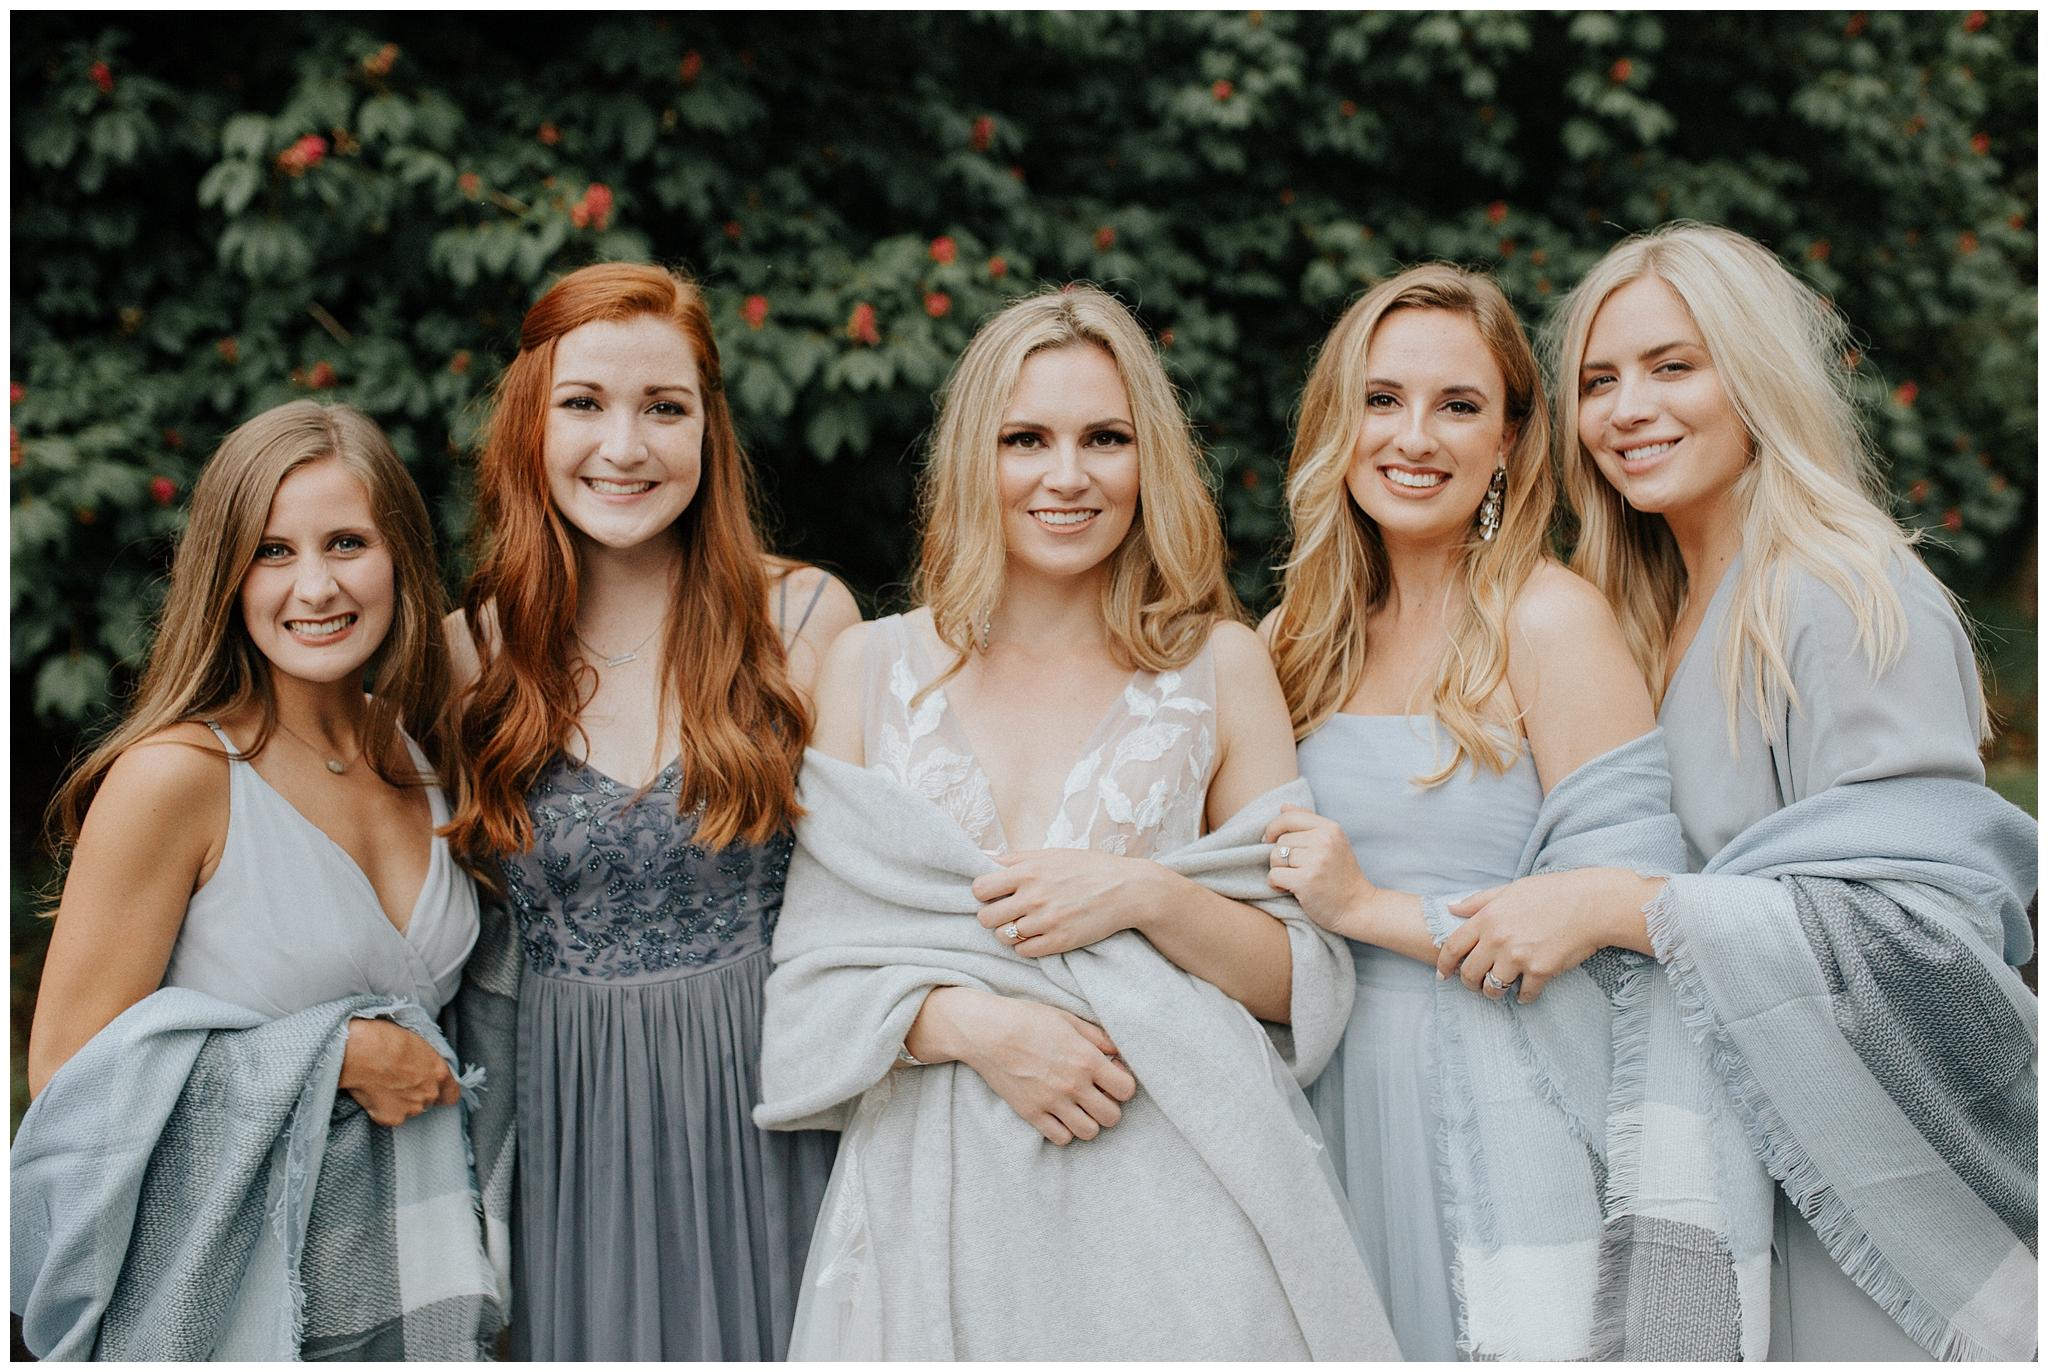 austin-texas-scottish-wedding-bride-groom21991.JPG